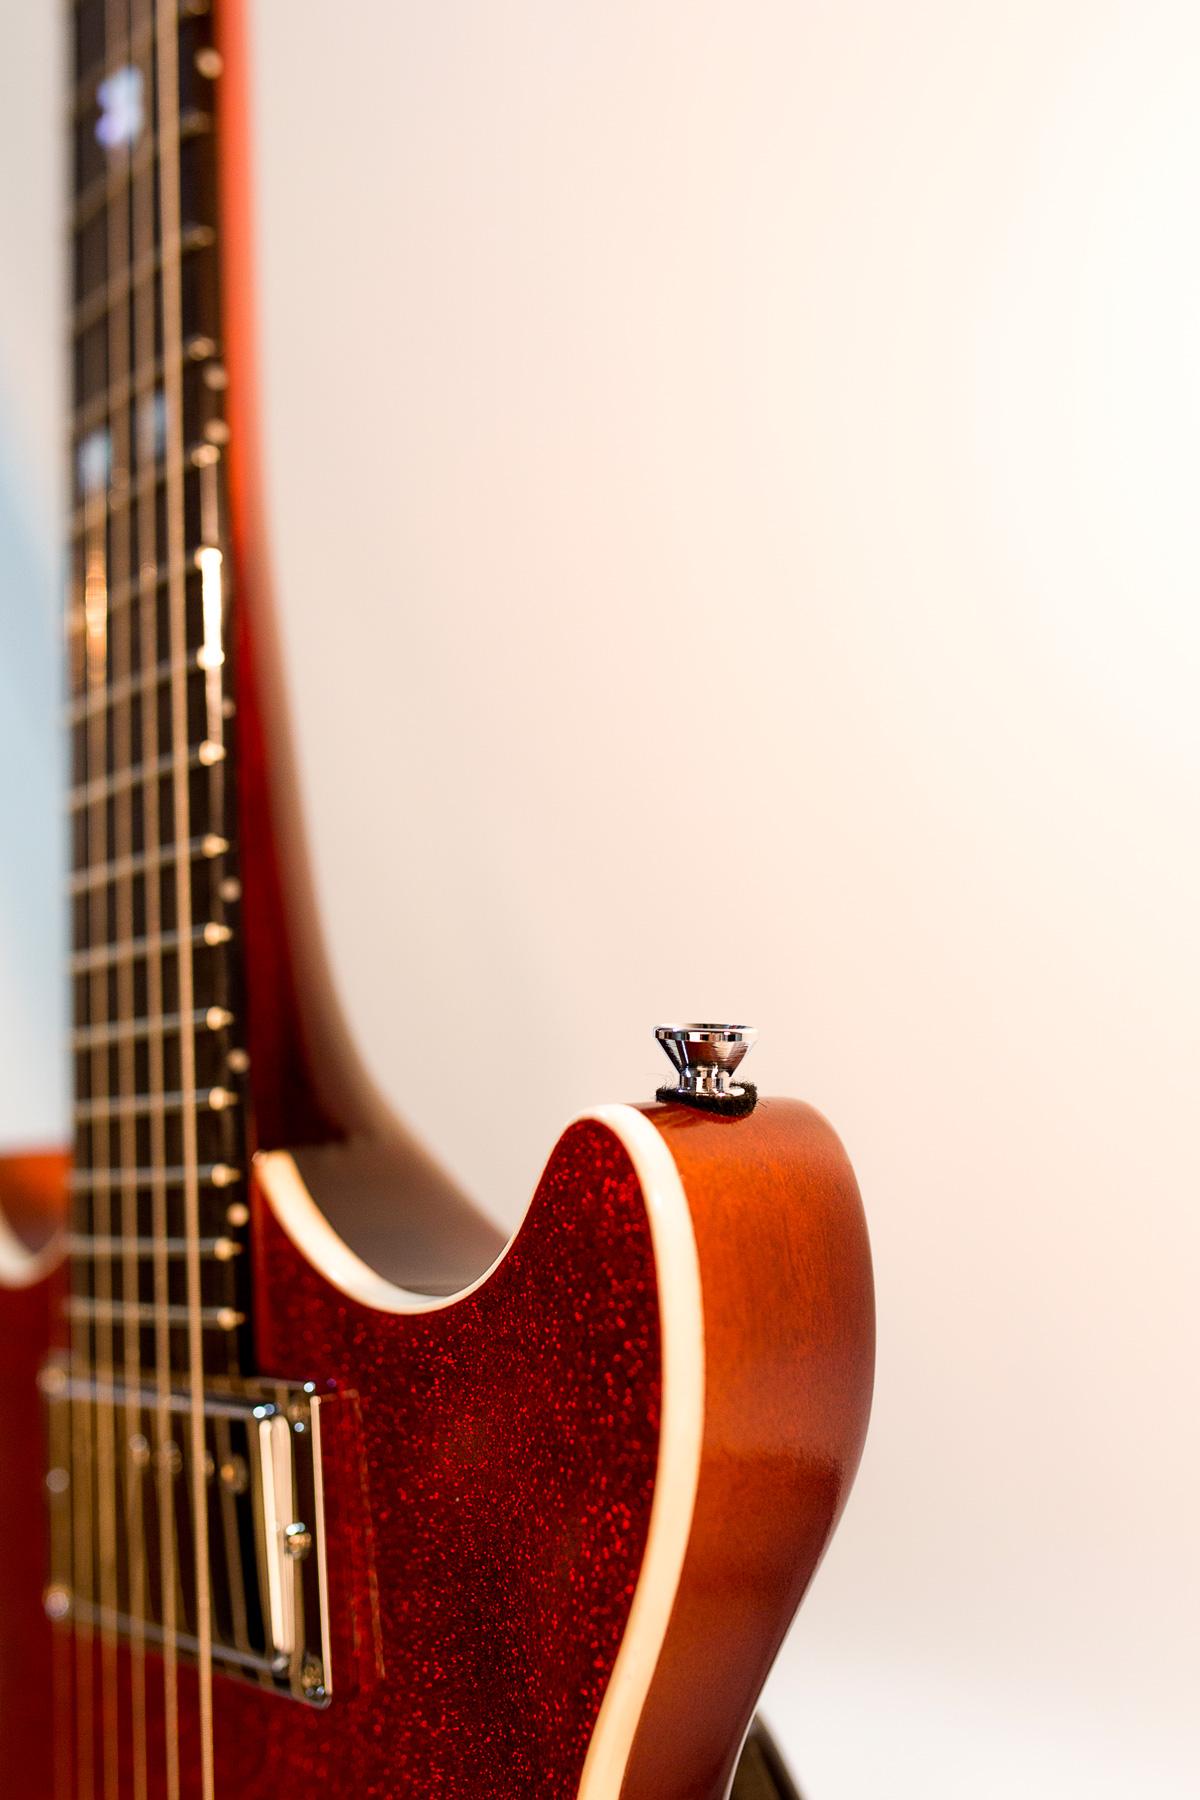 Pusiol_Lucky7 guitar